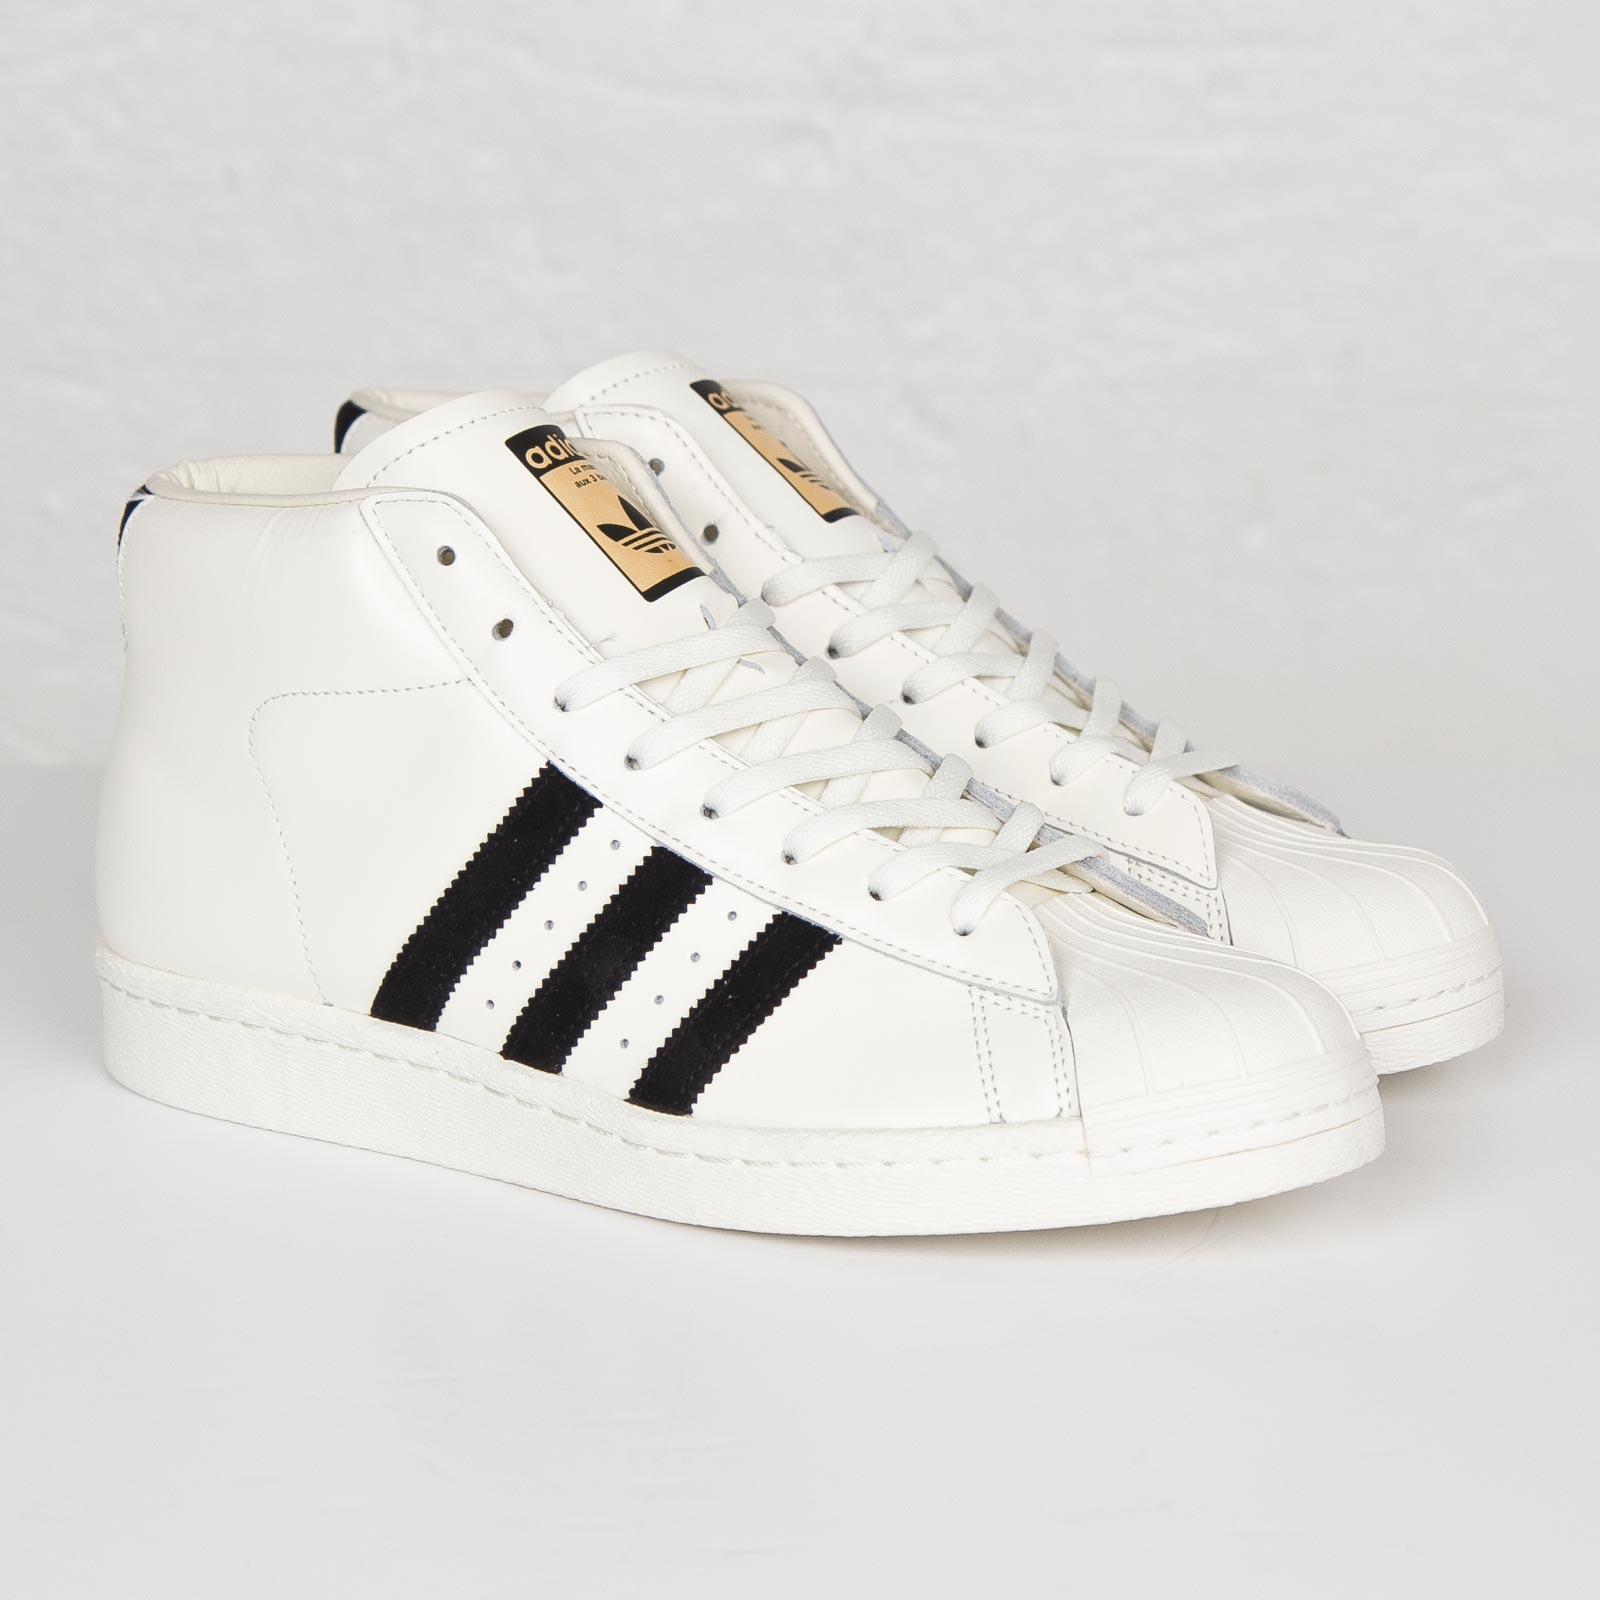 adidas modello deluxe b35246 sneakersnstuff scarpe vintage pro